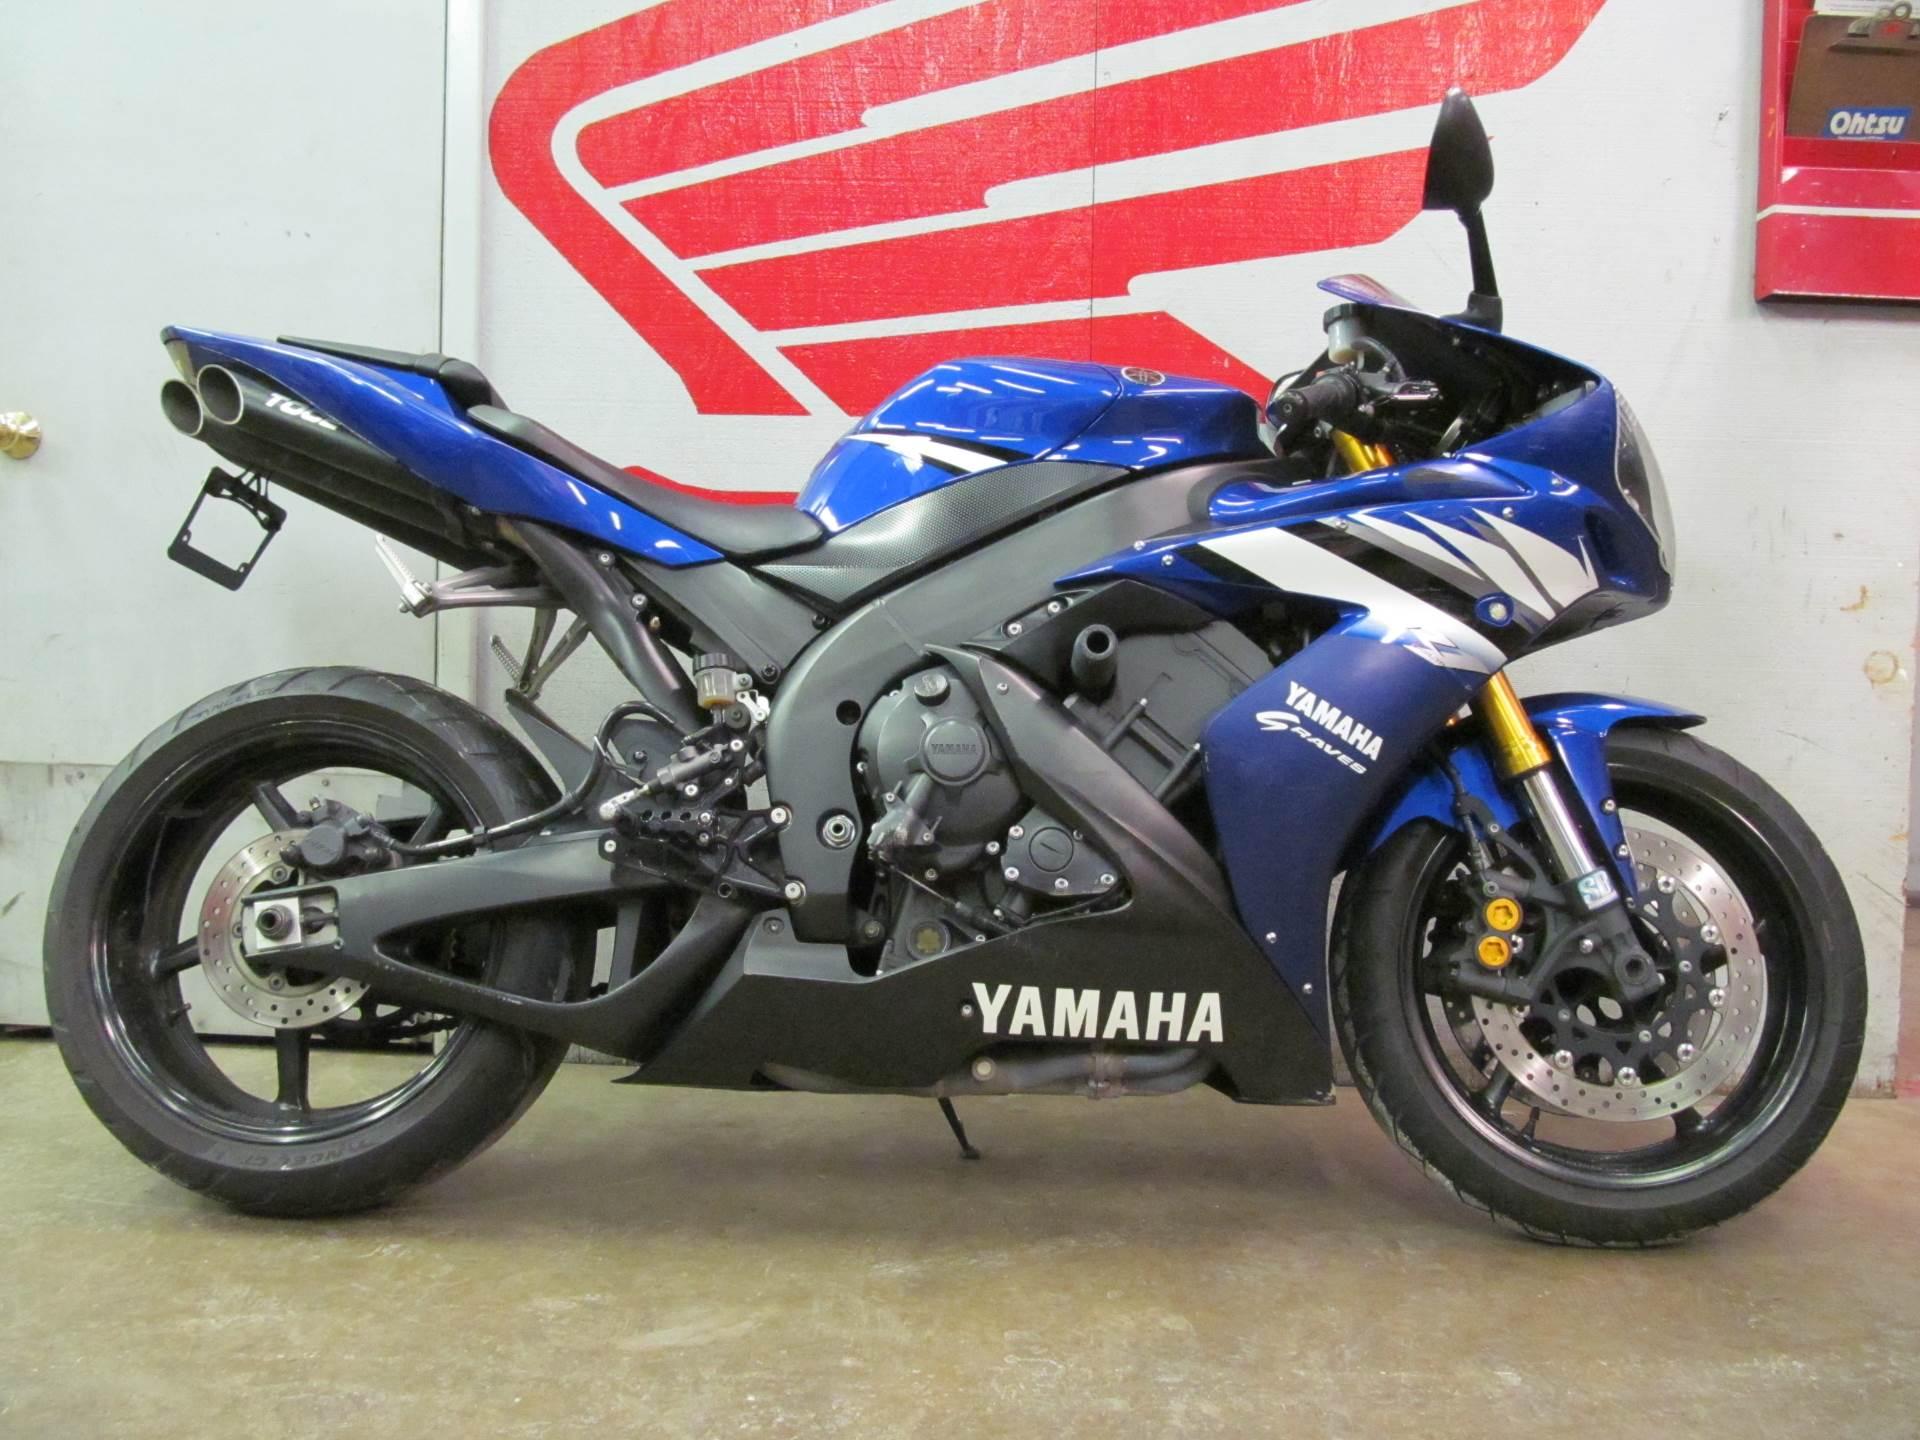 2006 Yamaha YZF-R1 for sale 107955